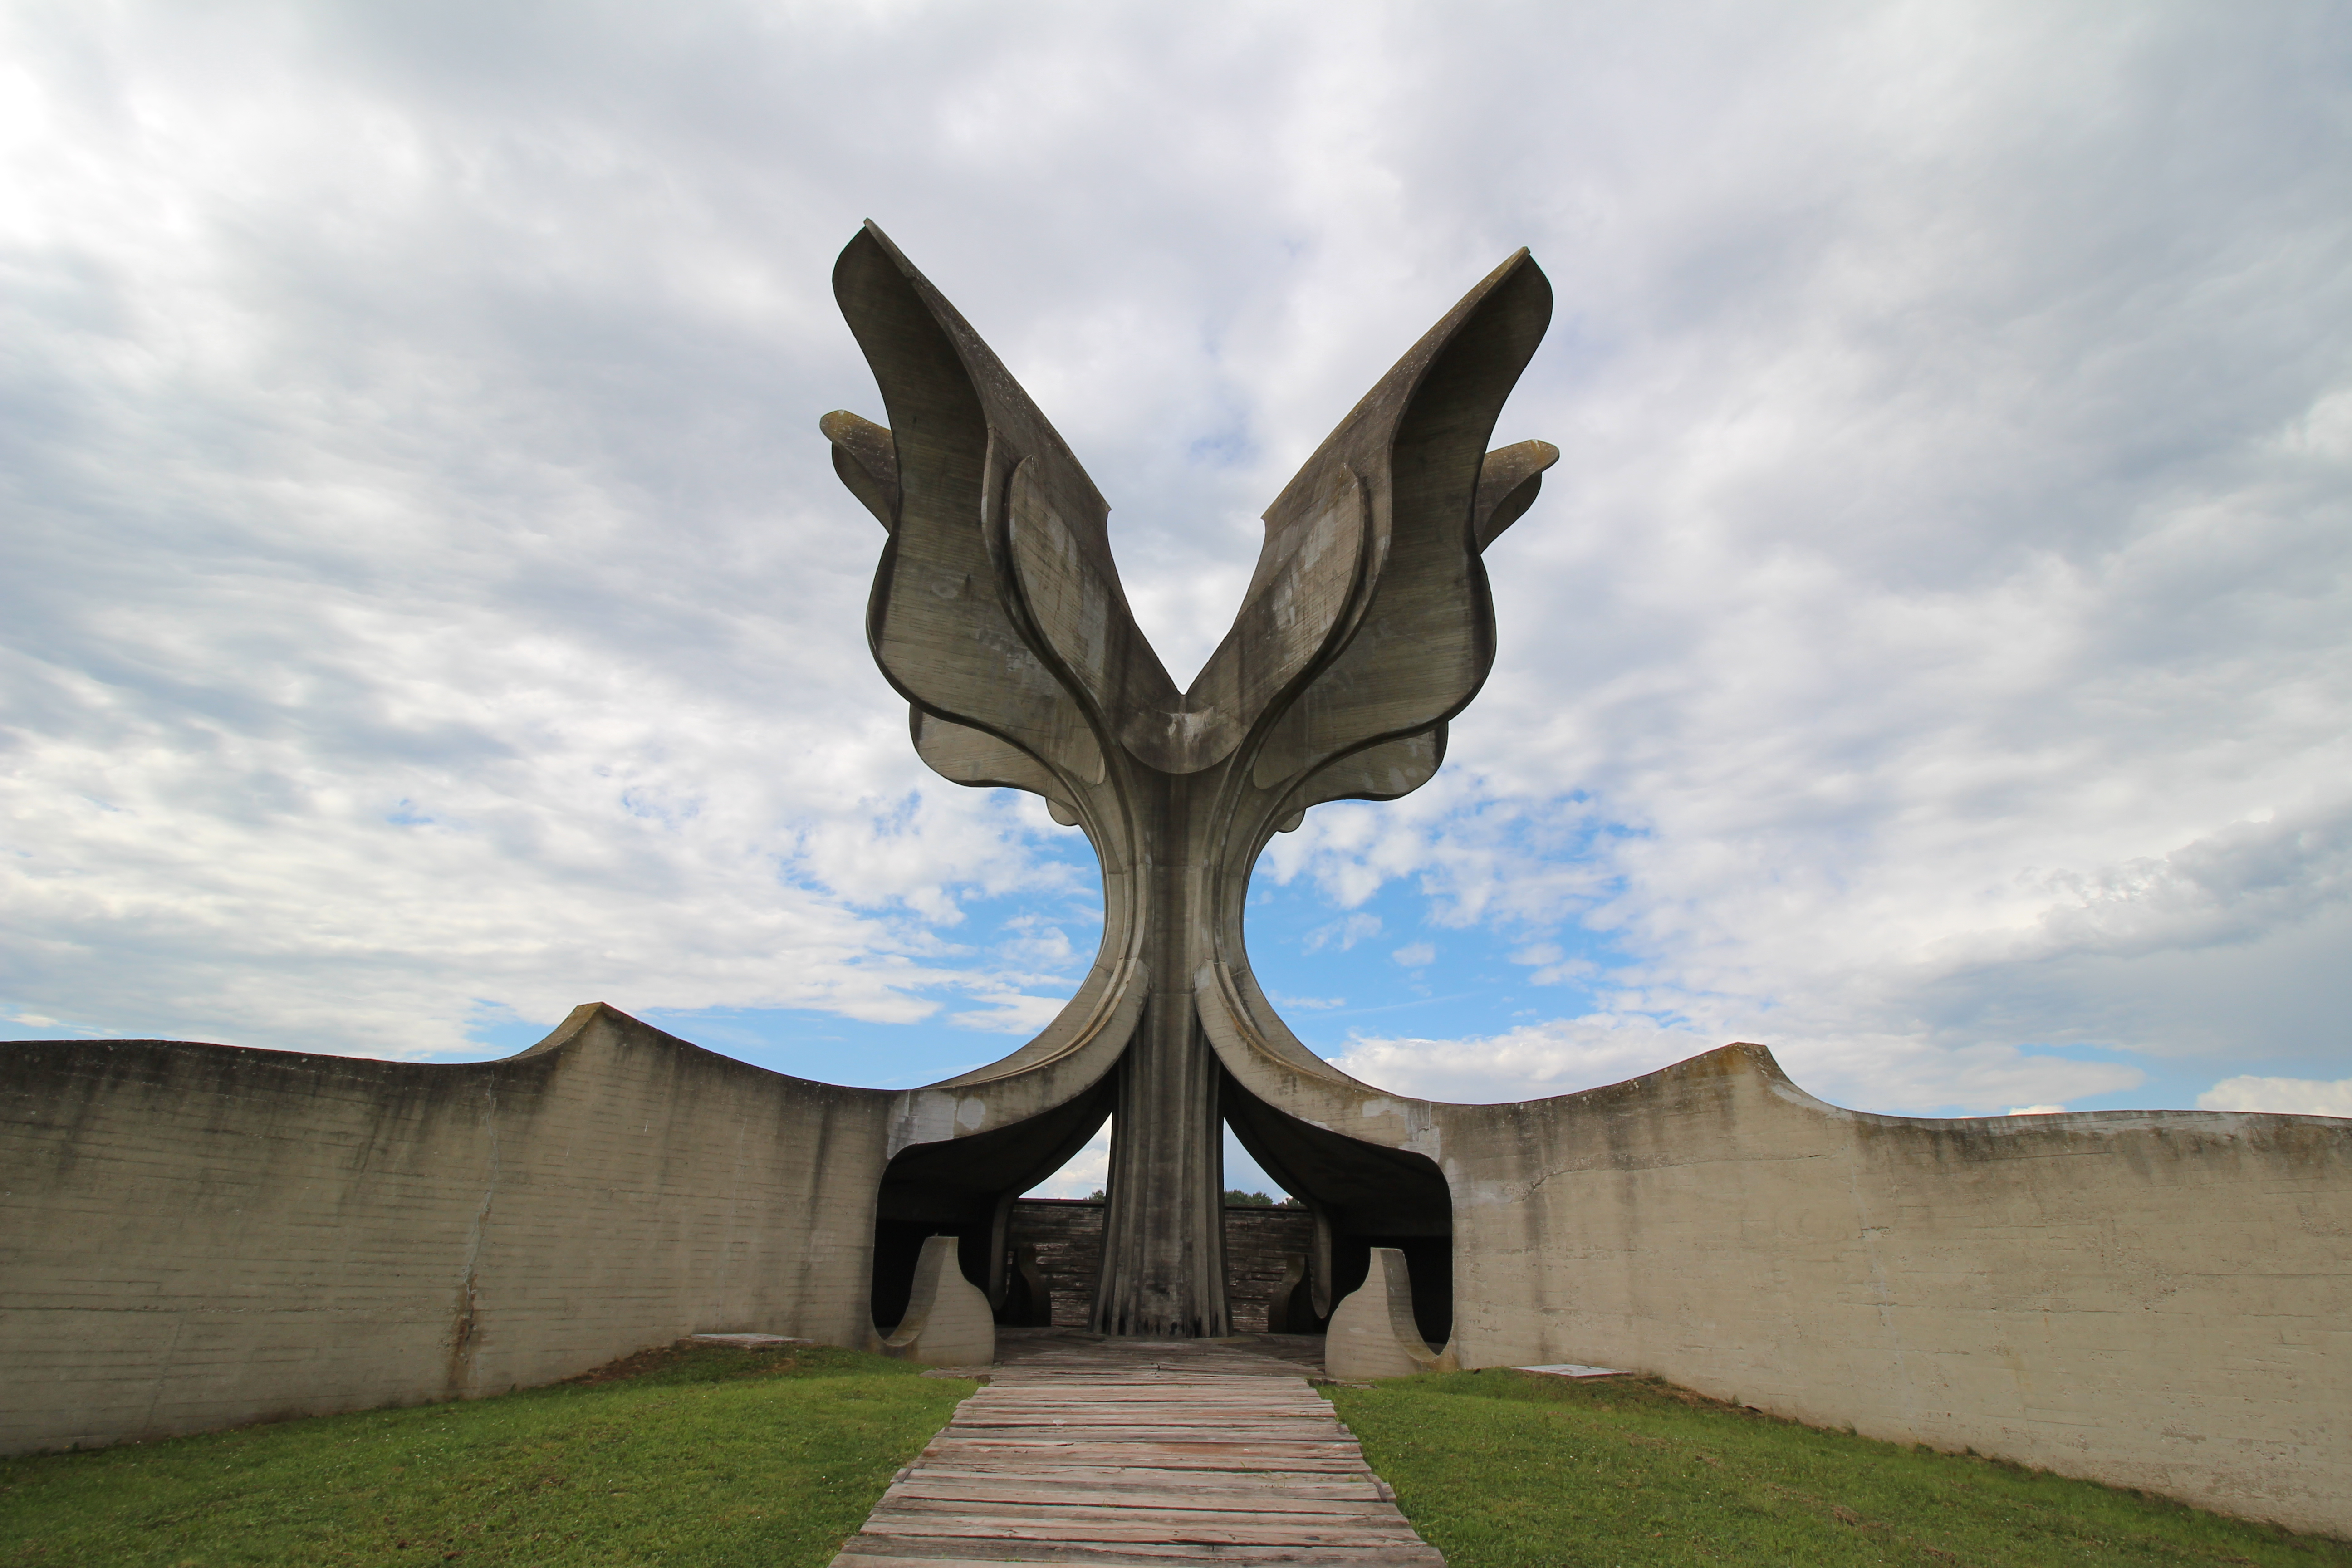 Heideggerjevska interpretacija spominskih skulptur Bogdana Bogdanovića